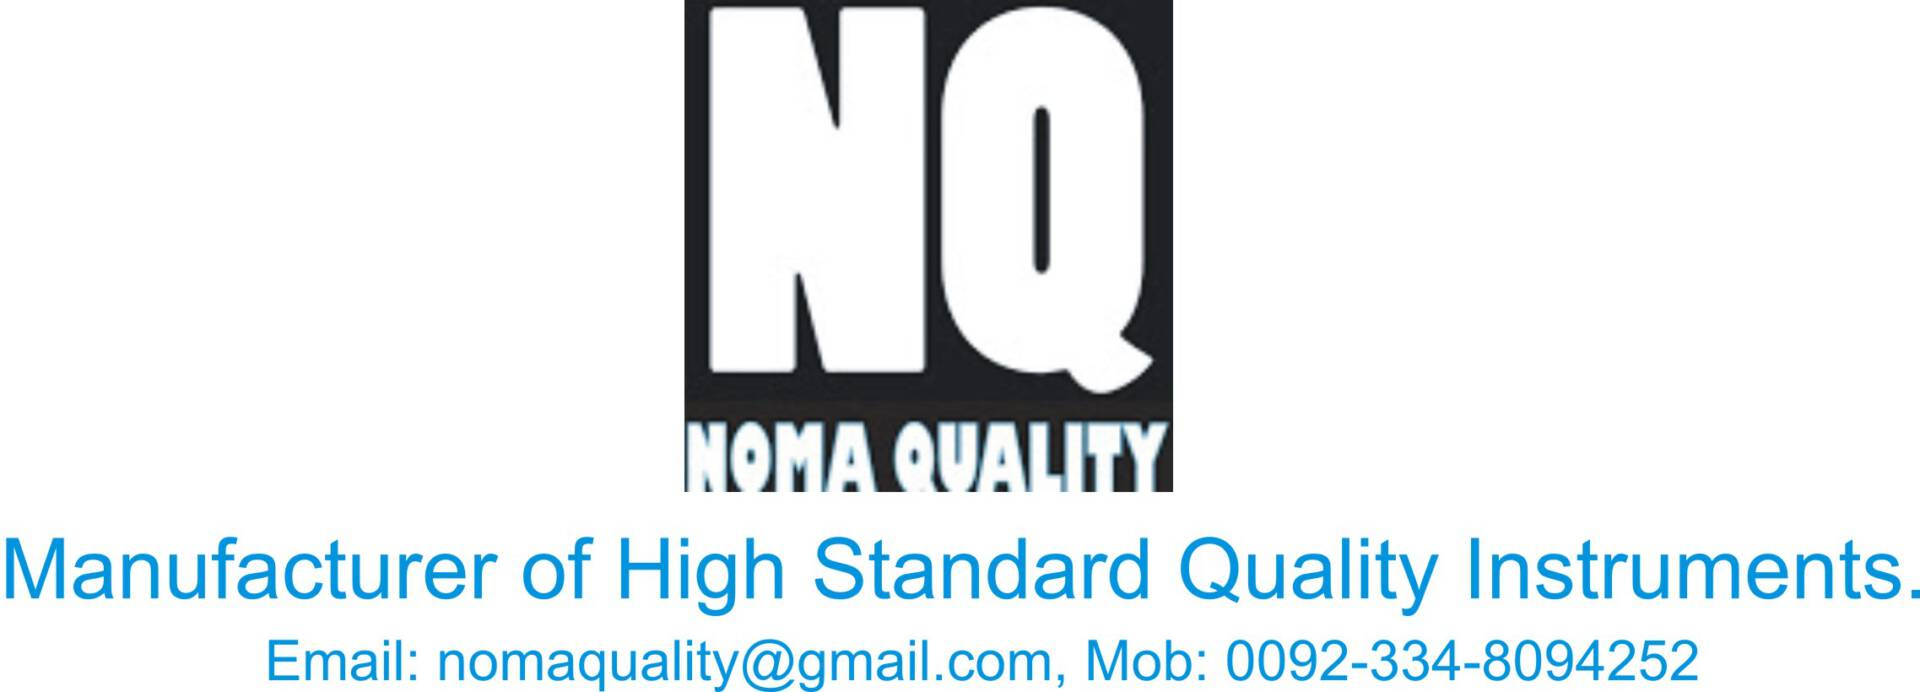 NOMA QUALITY